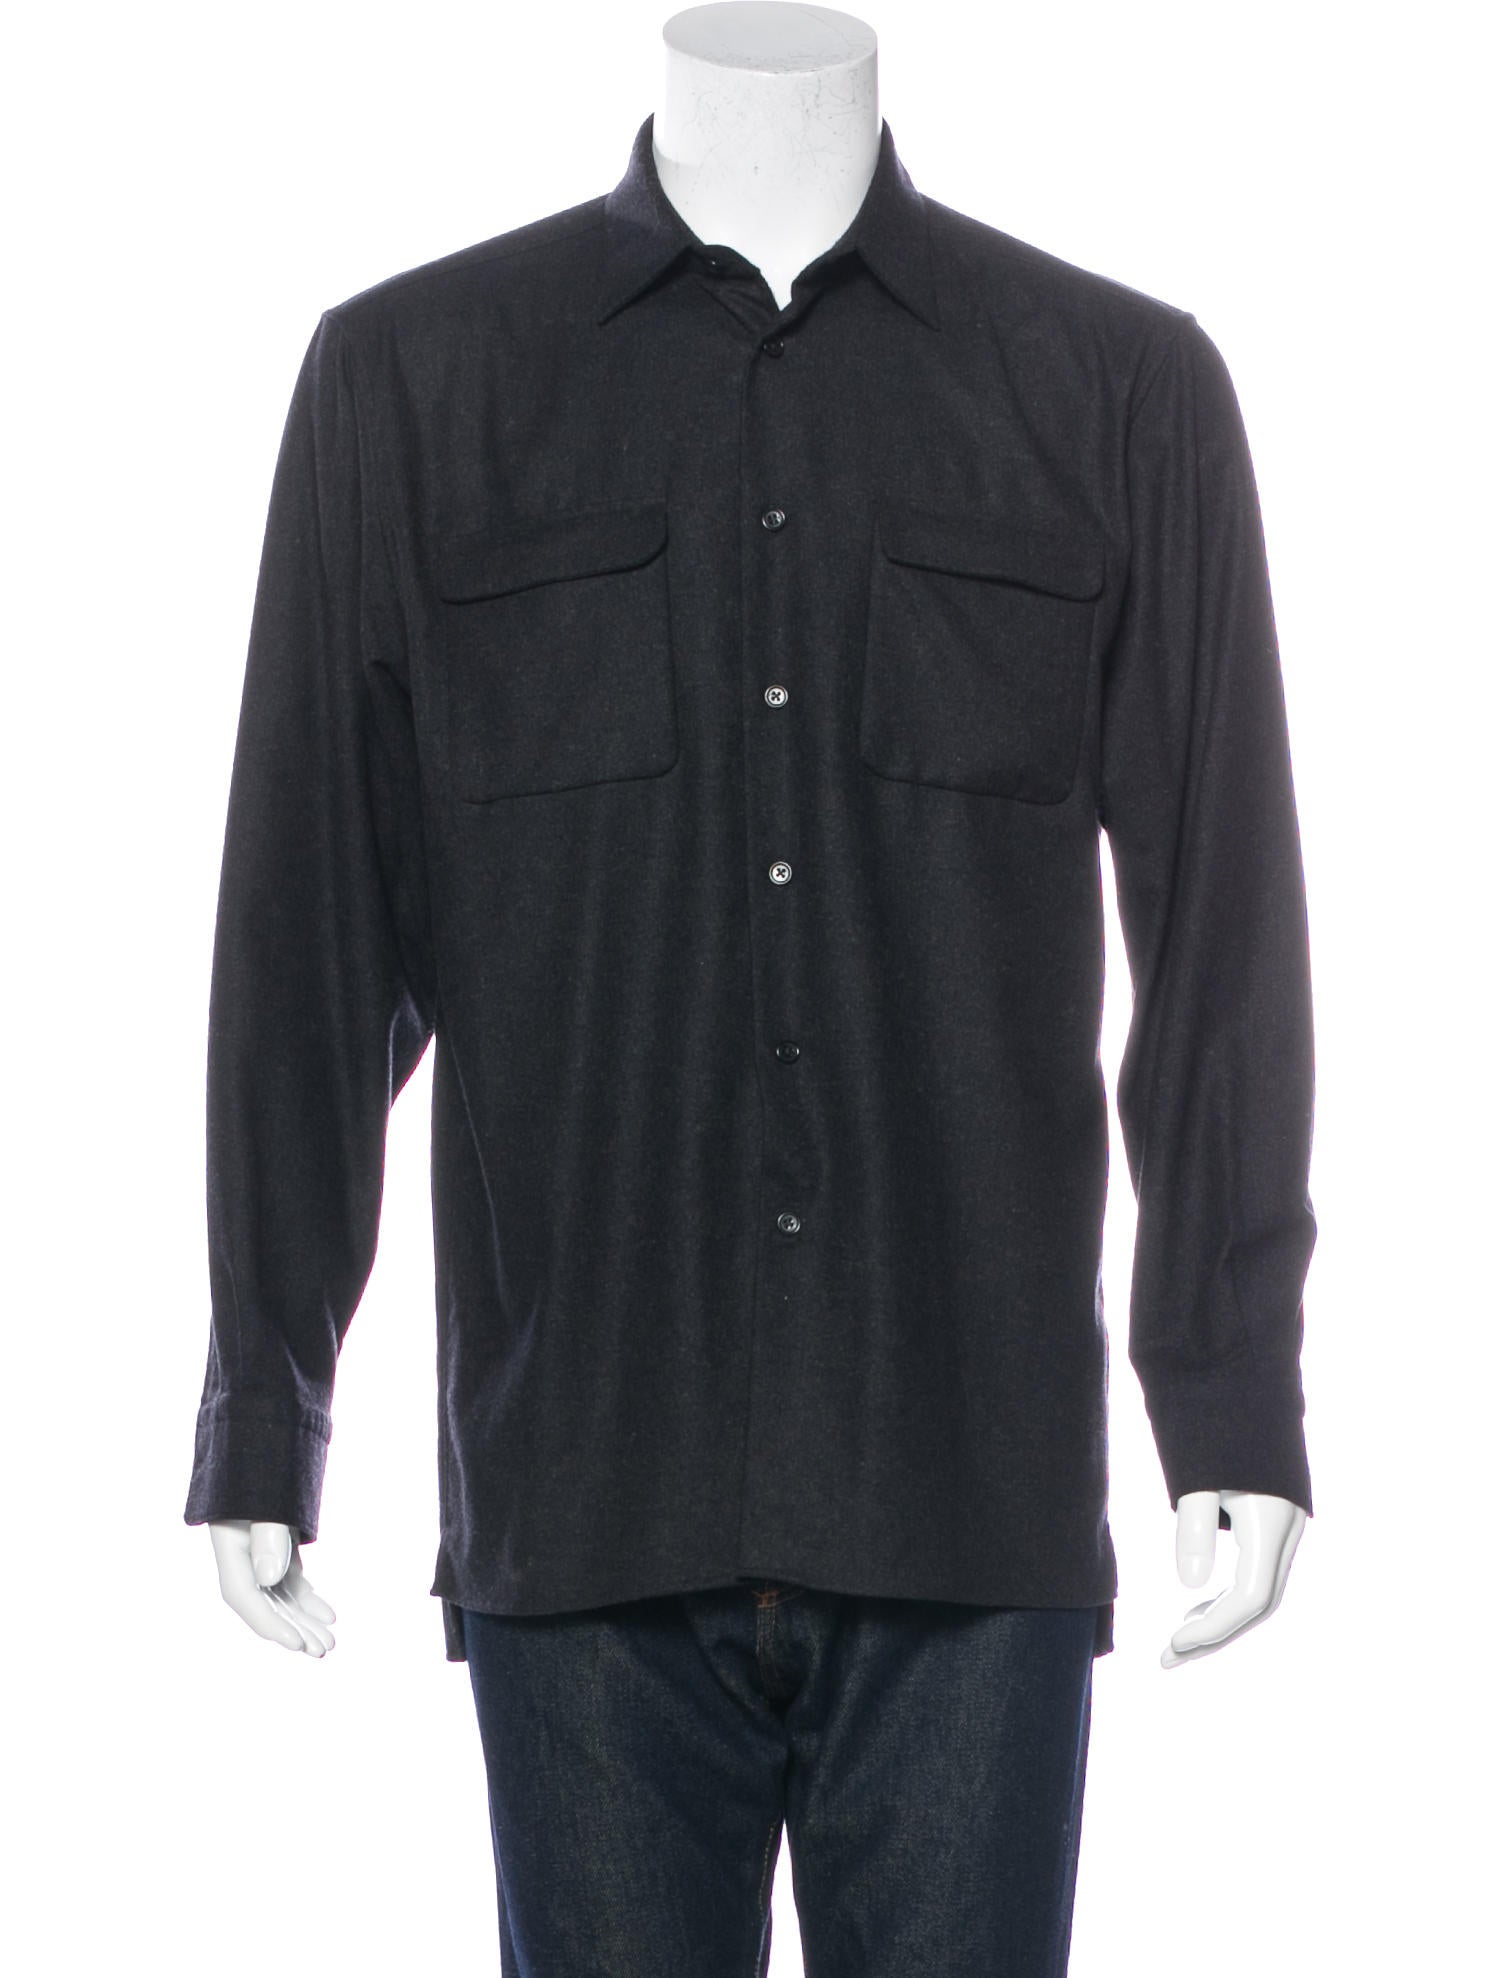 John varvatos wool flannel shirt clothing jva22959 for Mens wool flannel shirt